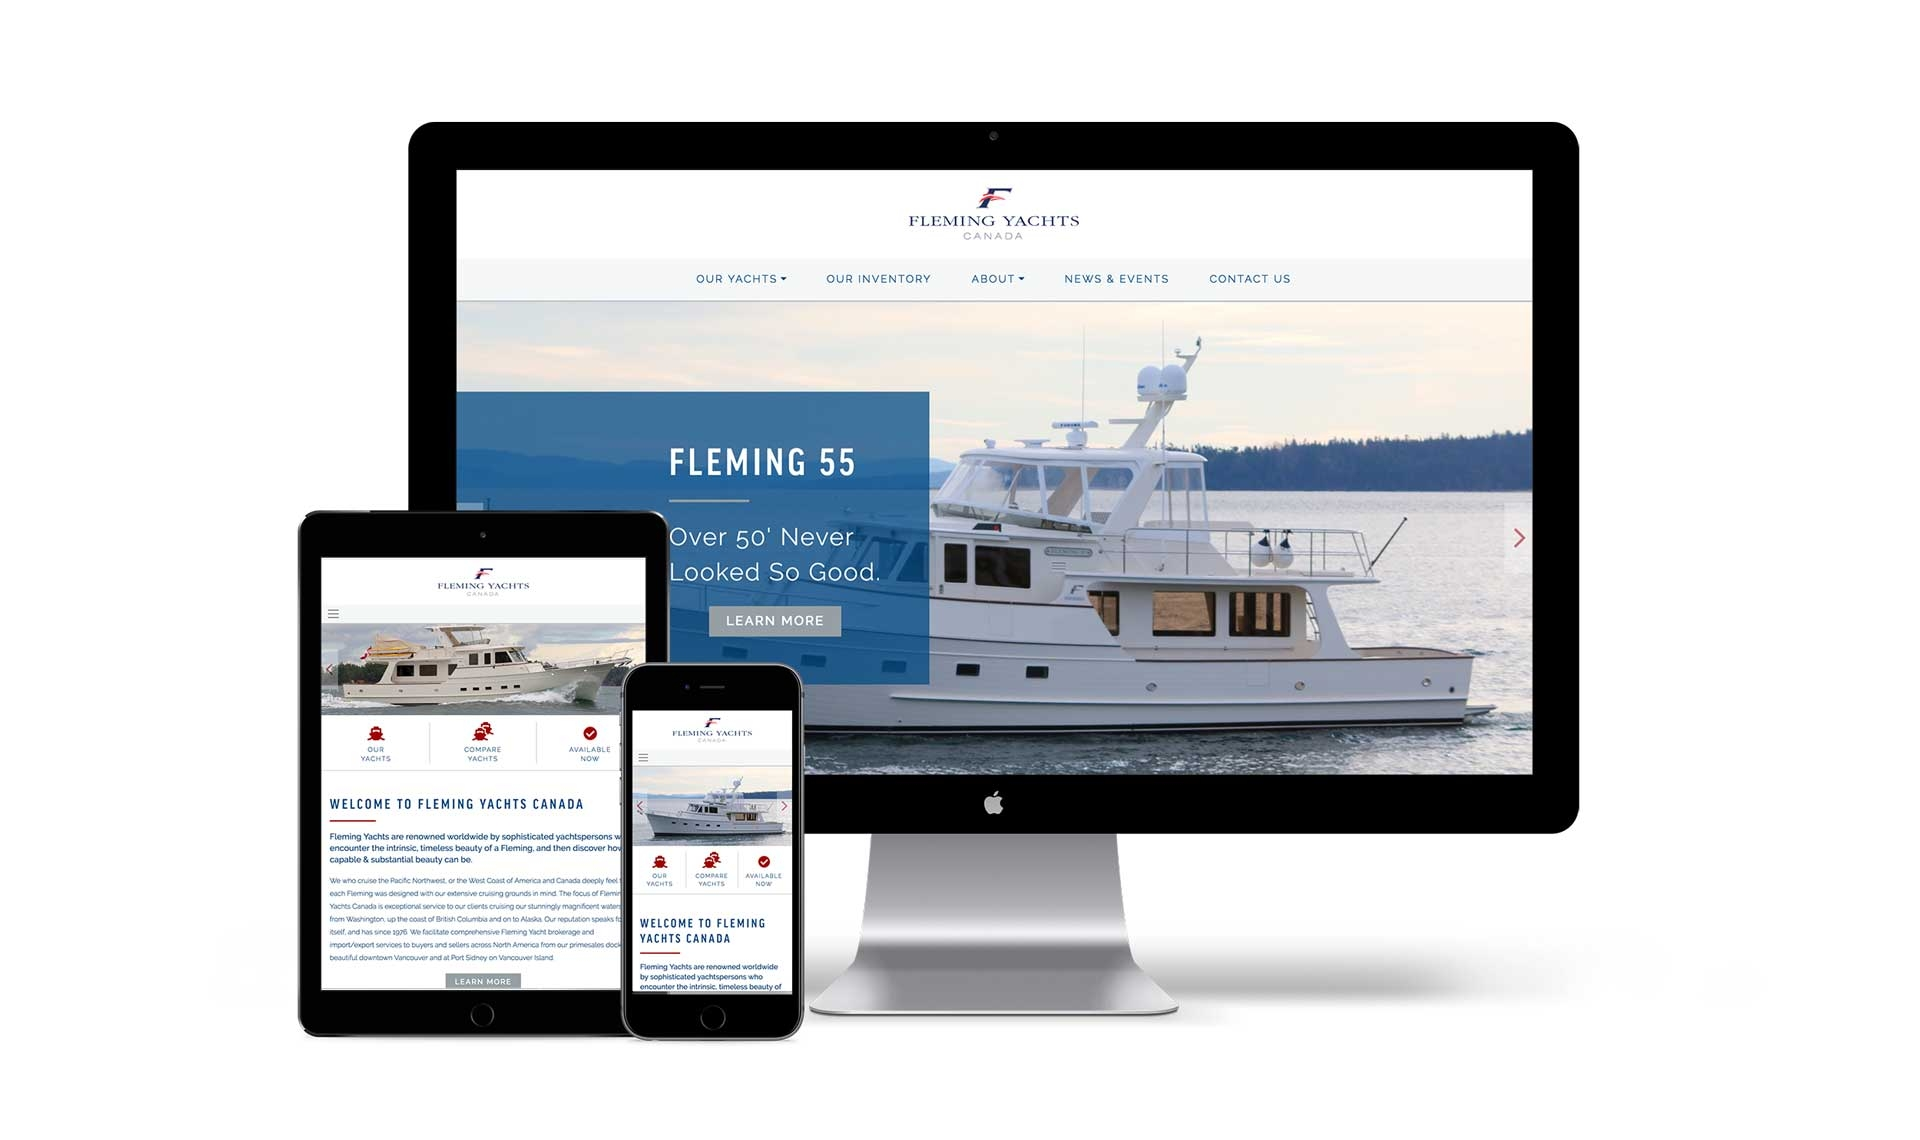 Fleming Yachts Canada